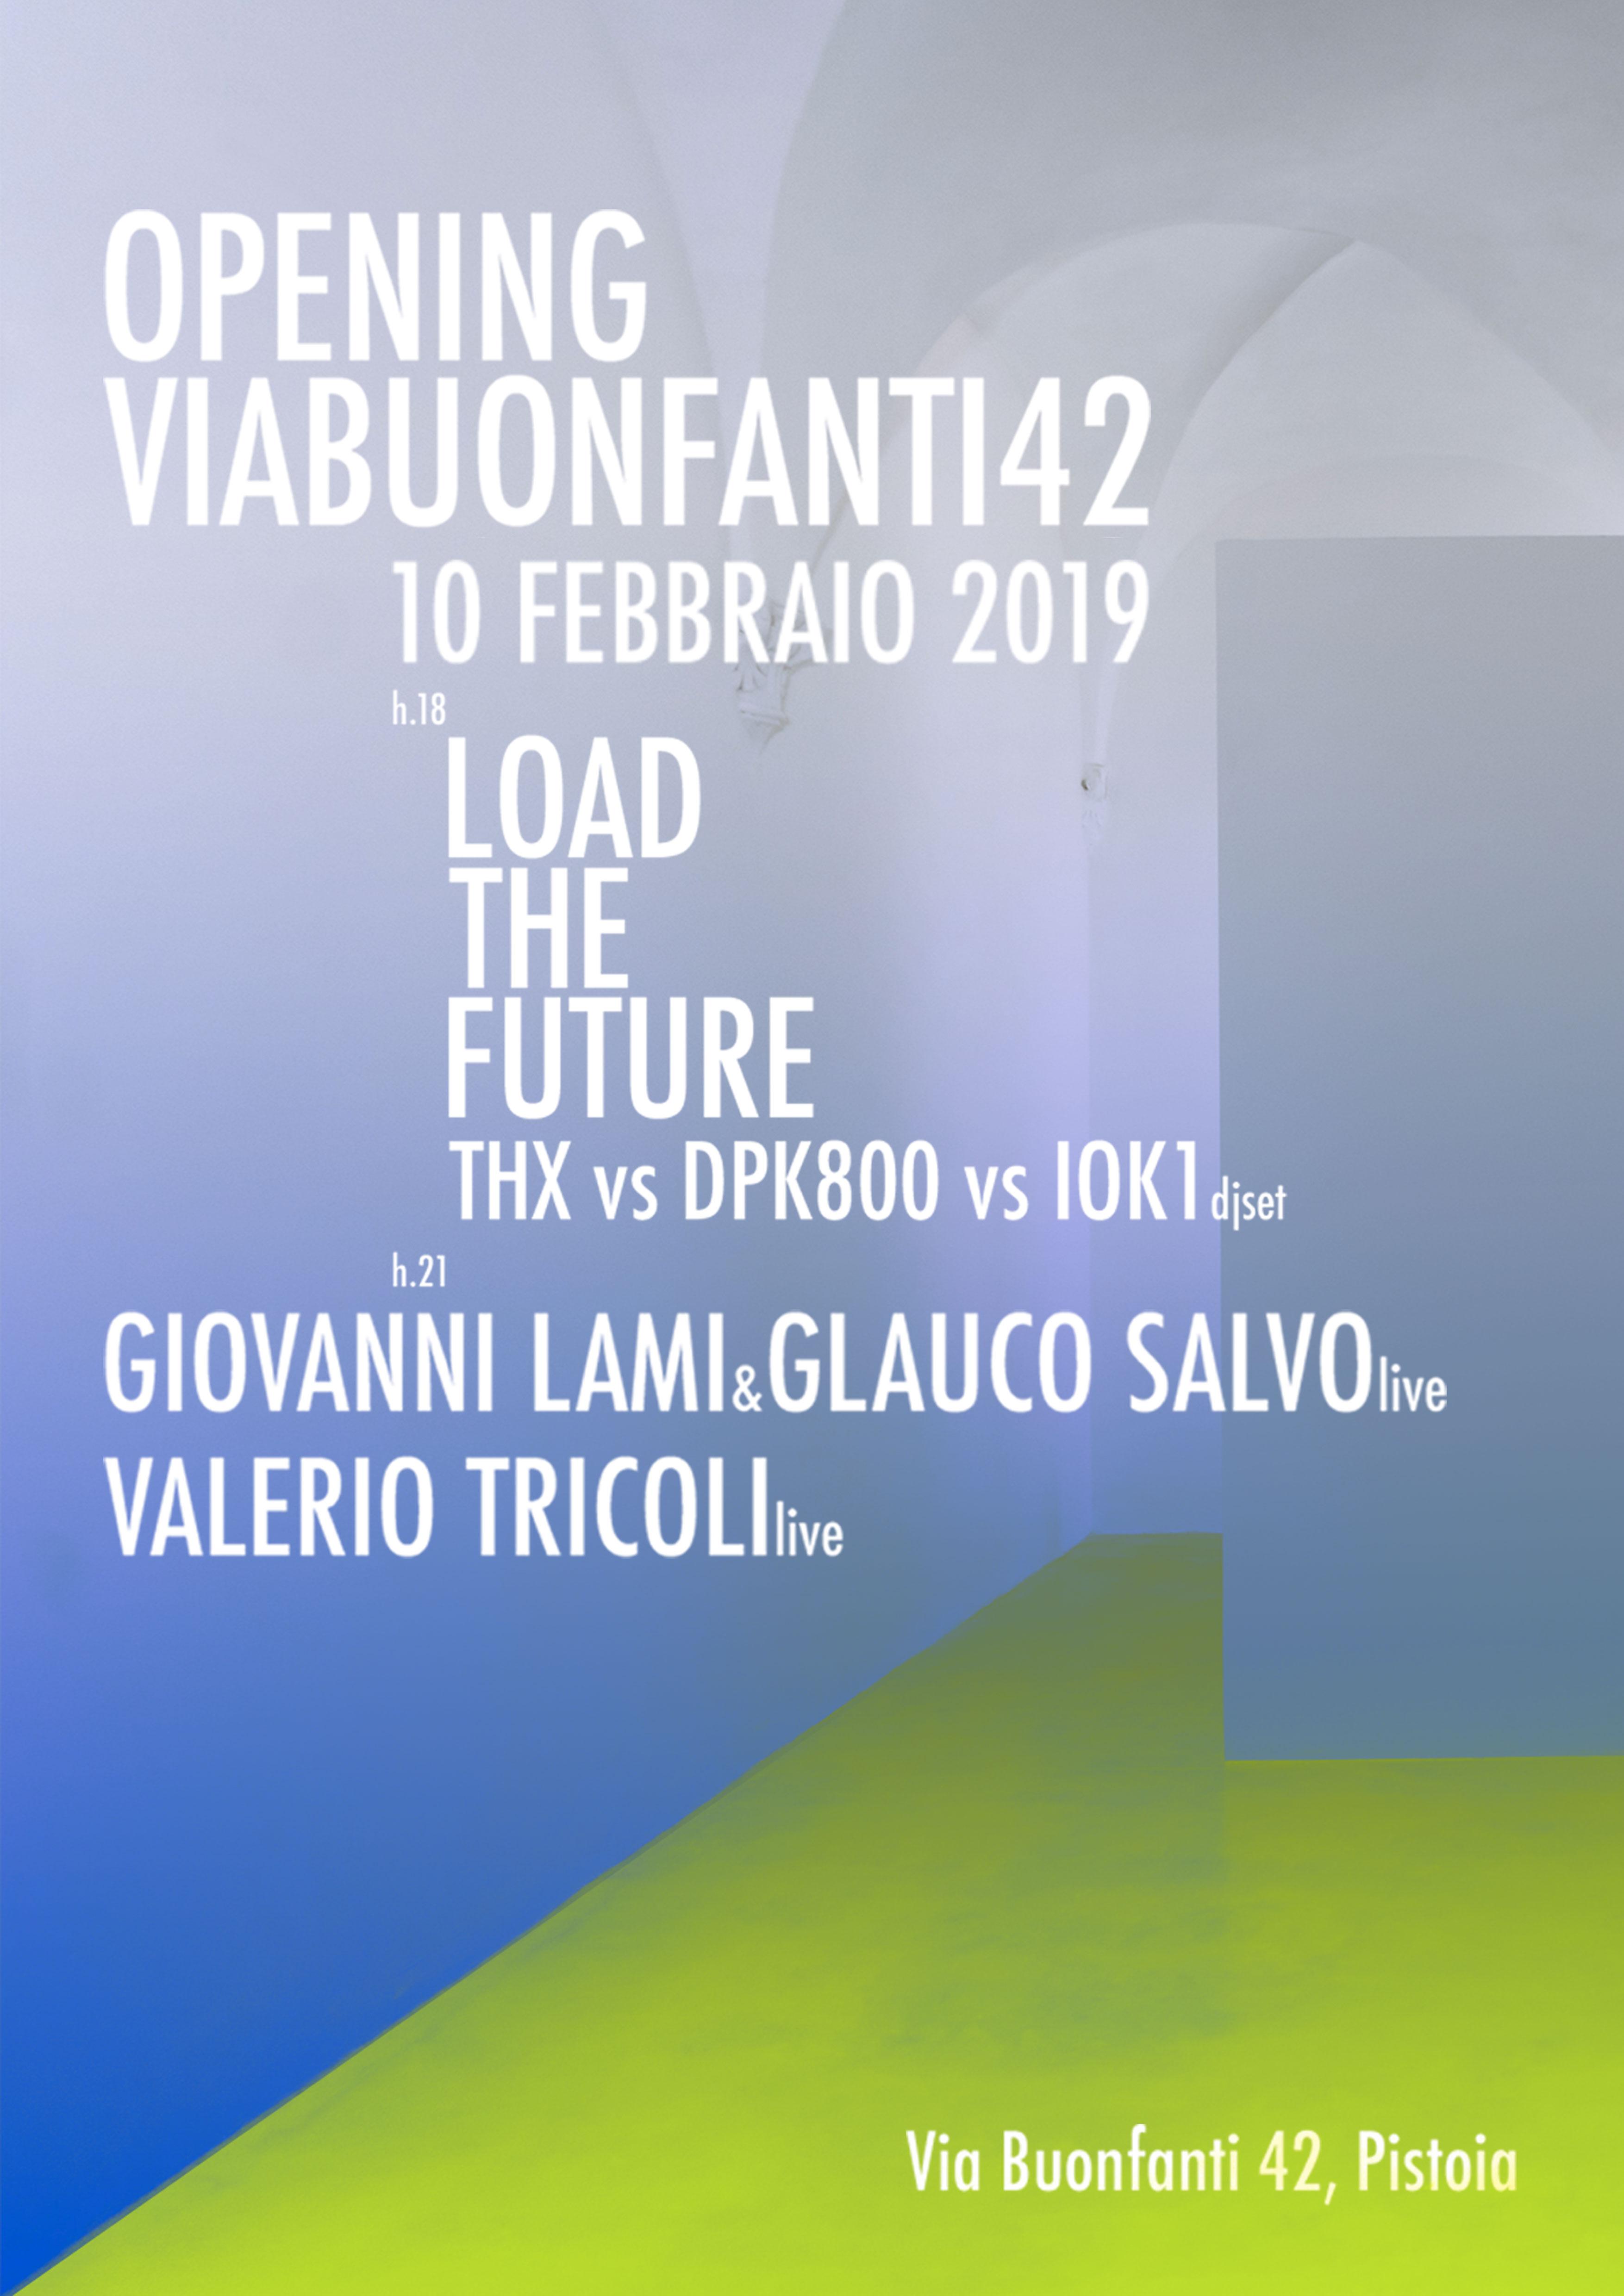 Viabuonfanti42-opening2019-locandina